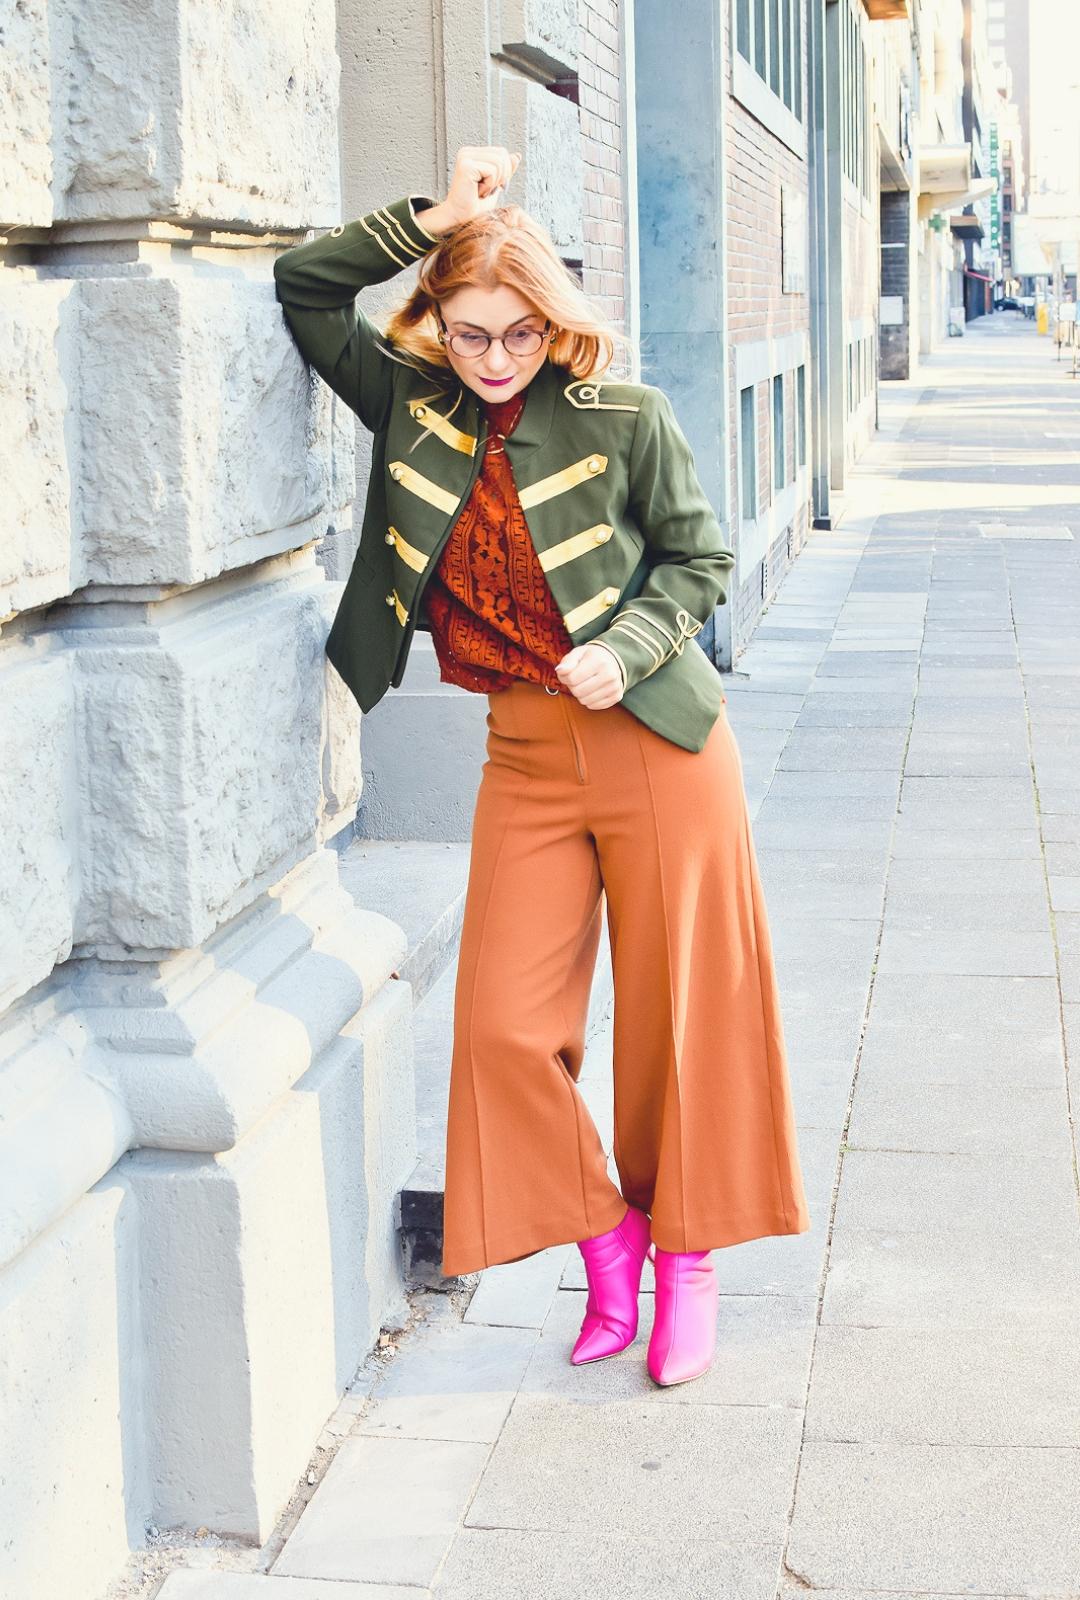 Olivgrüne Jacke, Streetstyle mit Oliv Grün